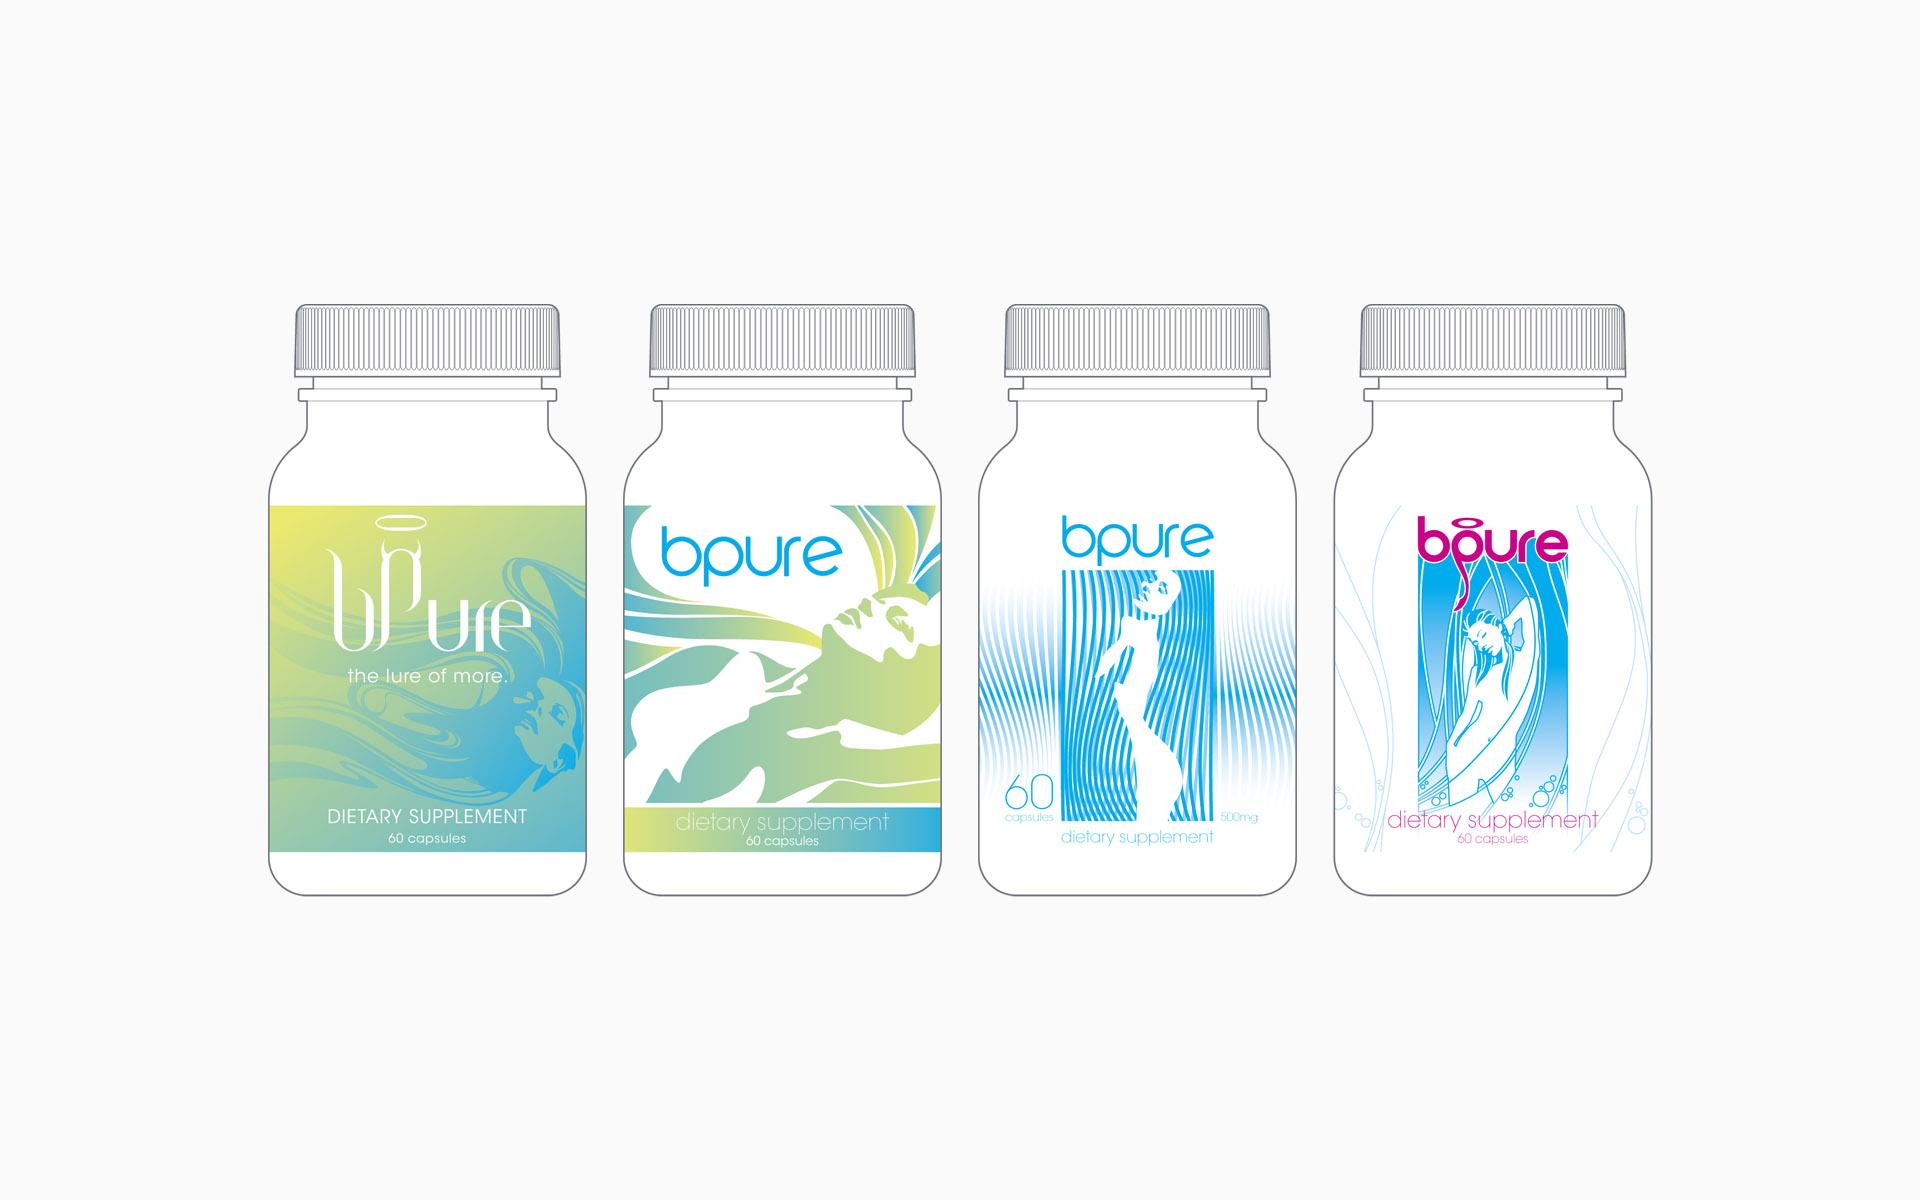 Lifestyle Nutrition bPure Labeling